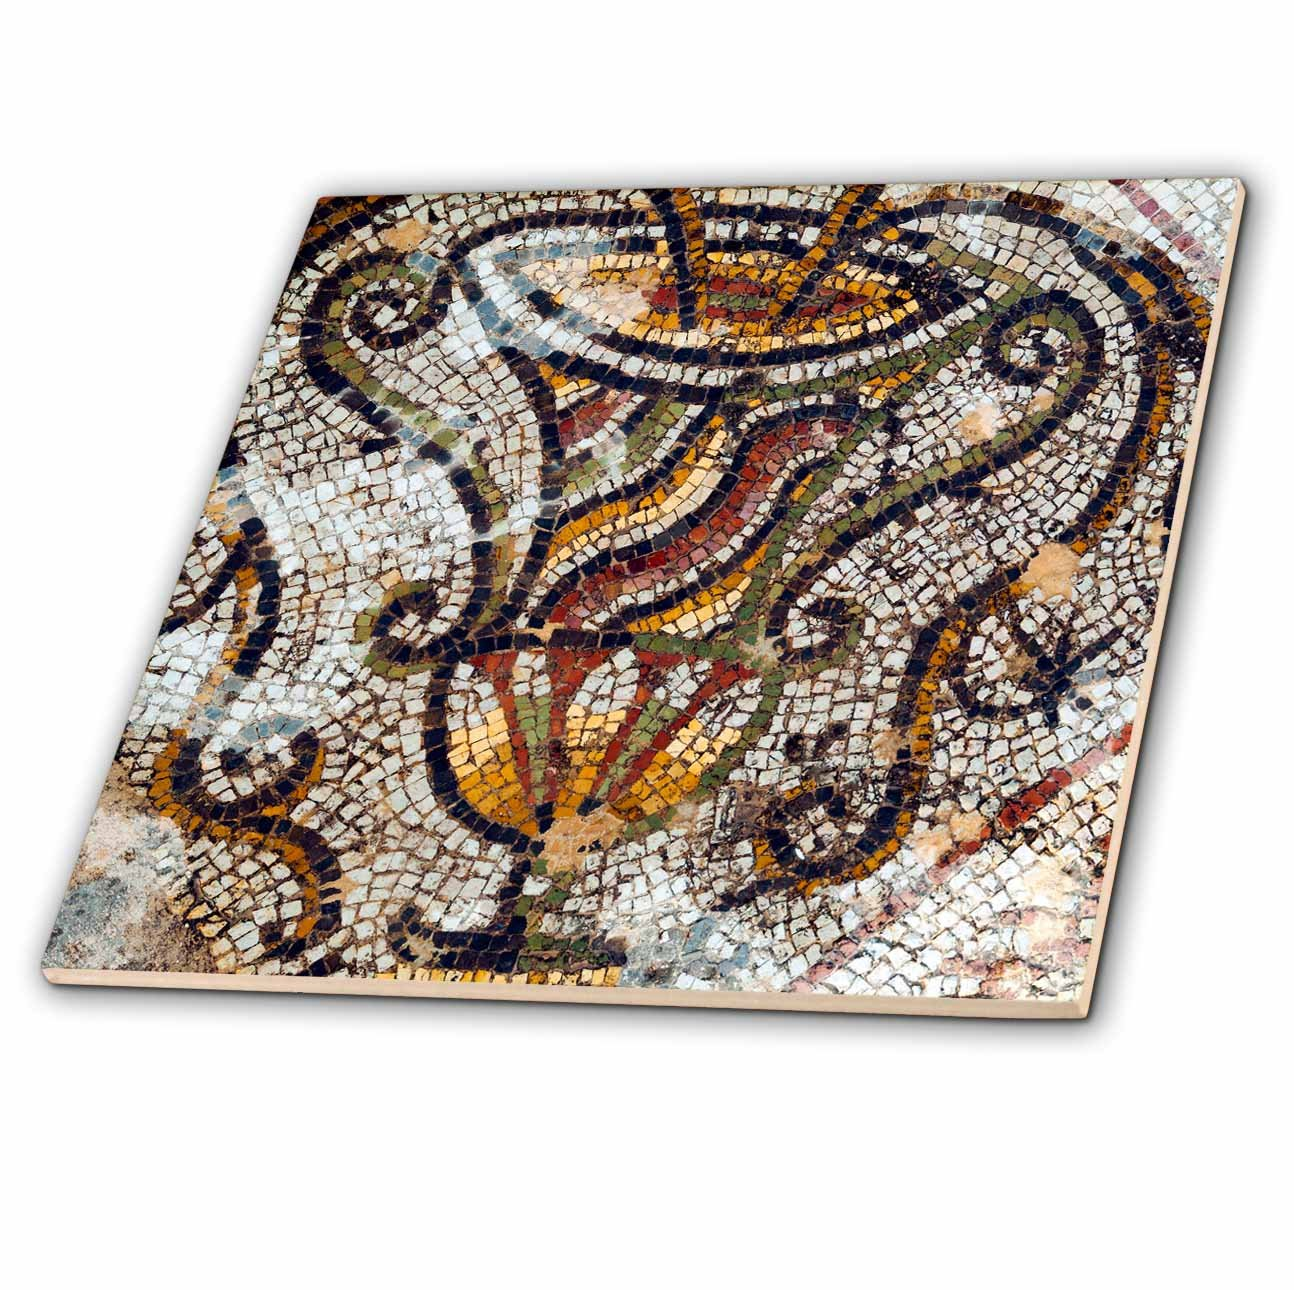 3dRose Danita Delimont - Artwork - Jar Mosaic, New House Of Hunt, Bulla Regia Archaeology Site, Tunisia - 8 Inch Glass Tile (ct_276611_7)